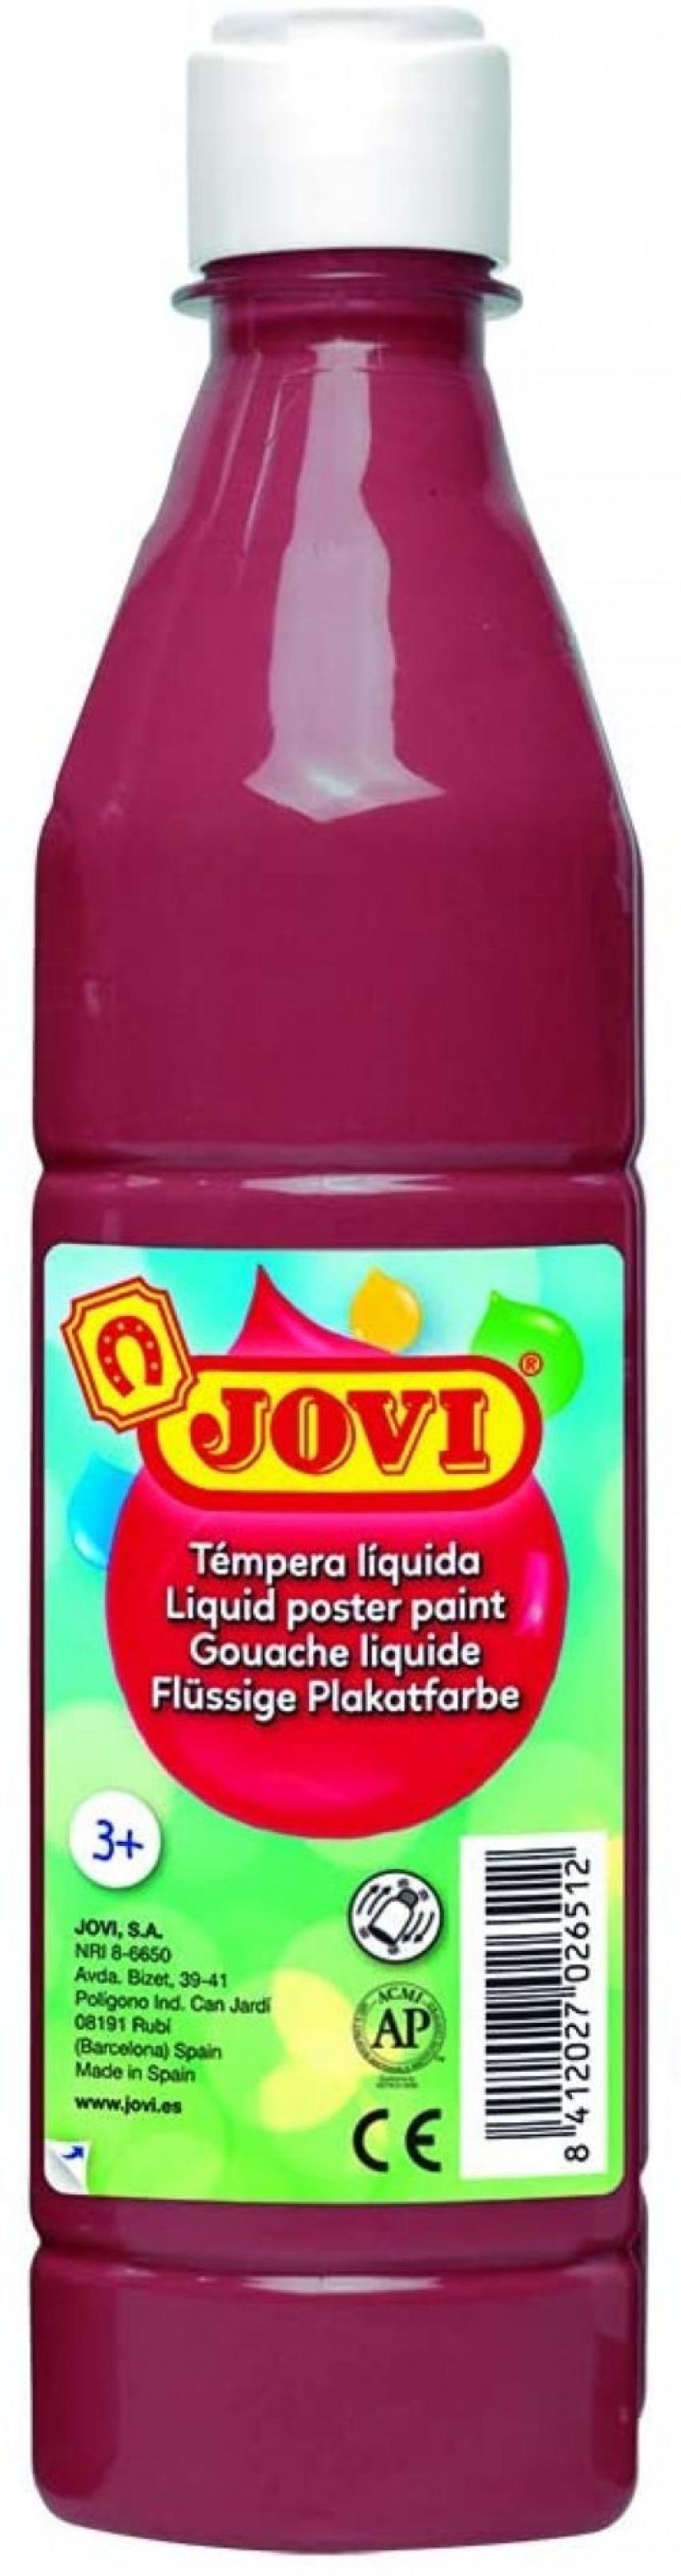 Bote tempera liquida jovi marron 500 ml 8412027003698